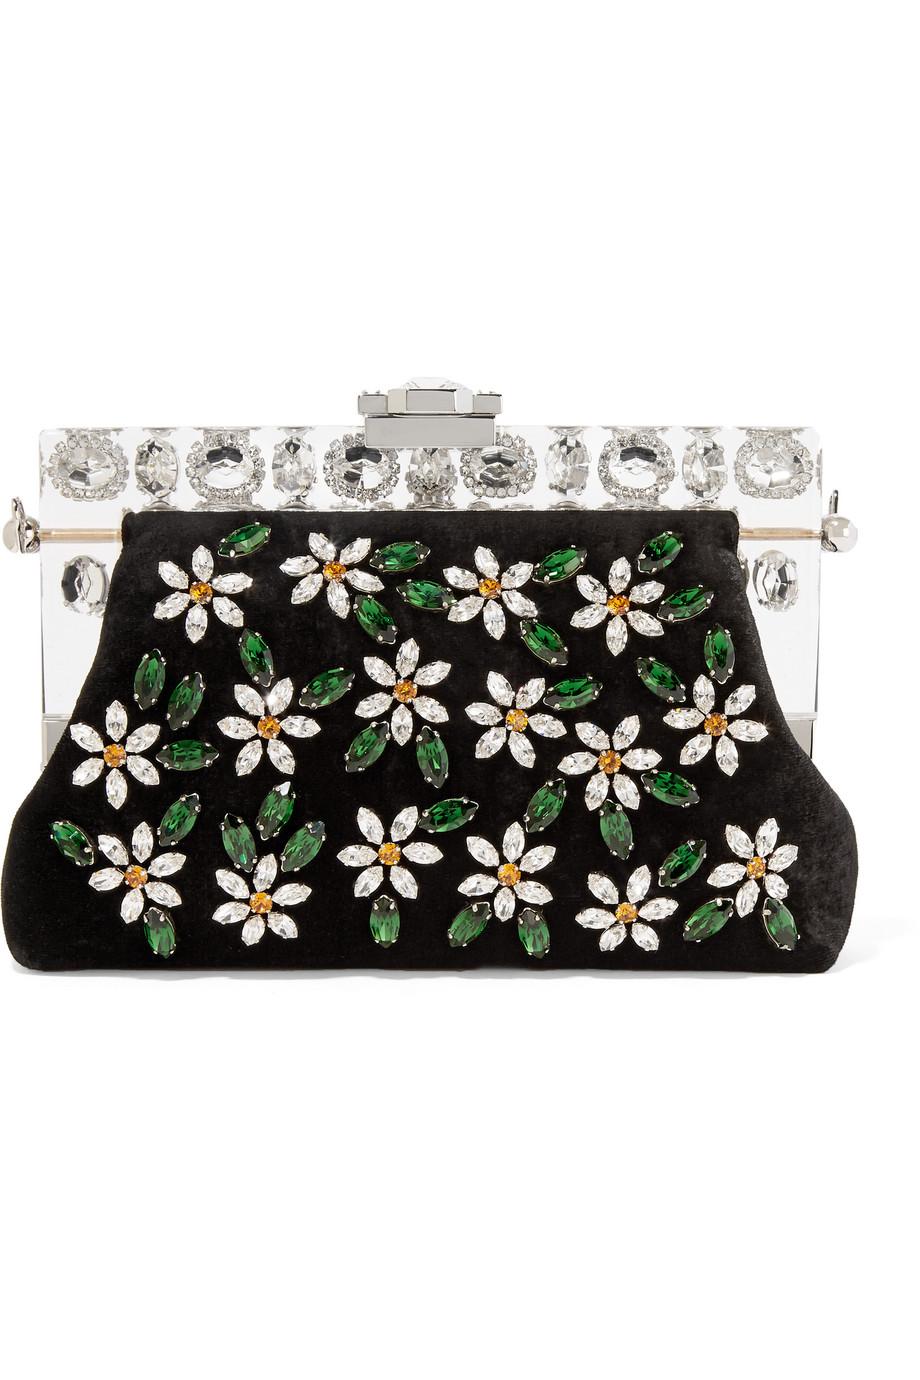 Dolce & Gabbana Vanda Small Swarovski Crystal-Embellished Velvet Clutch, Black/Silver, Women's